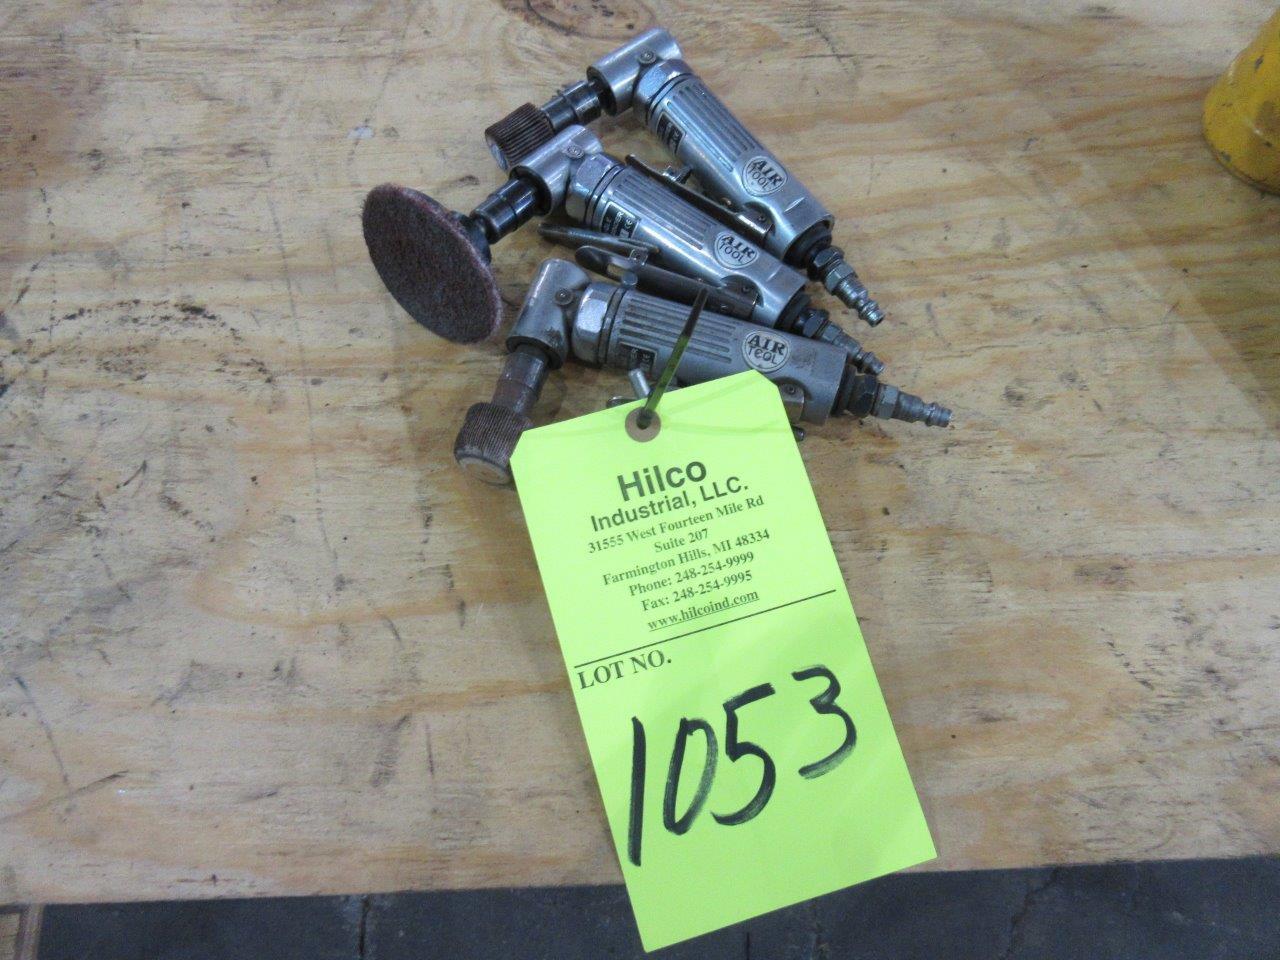 Lot 1053 - US Air Tool Pneumatic Angle